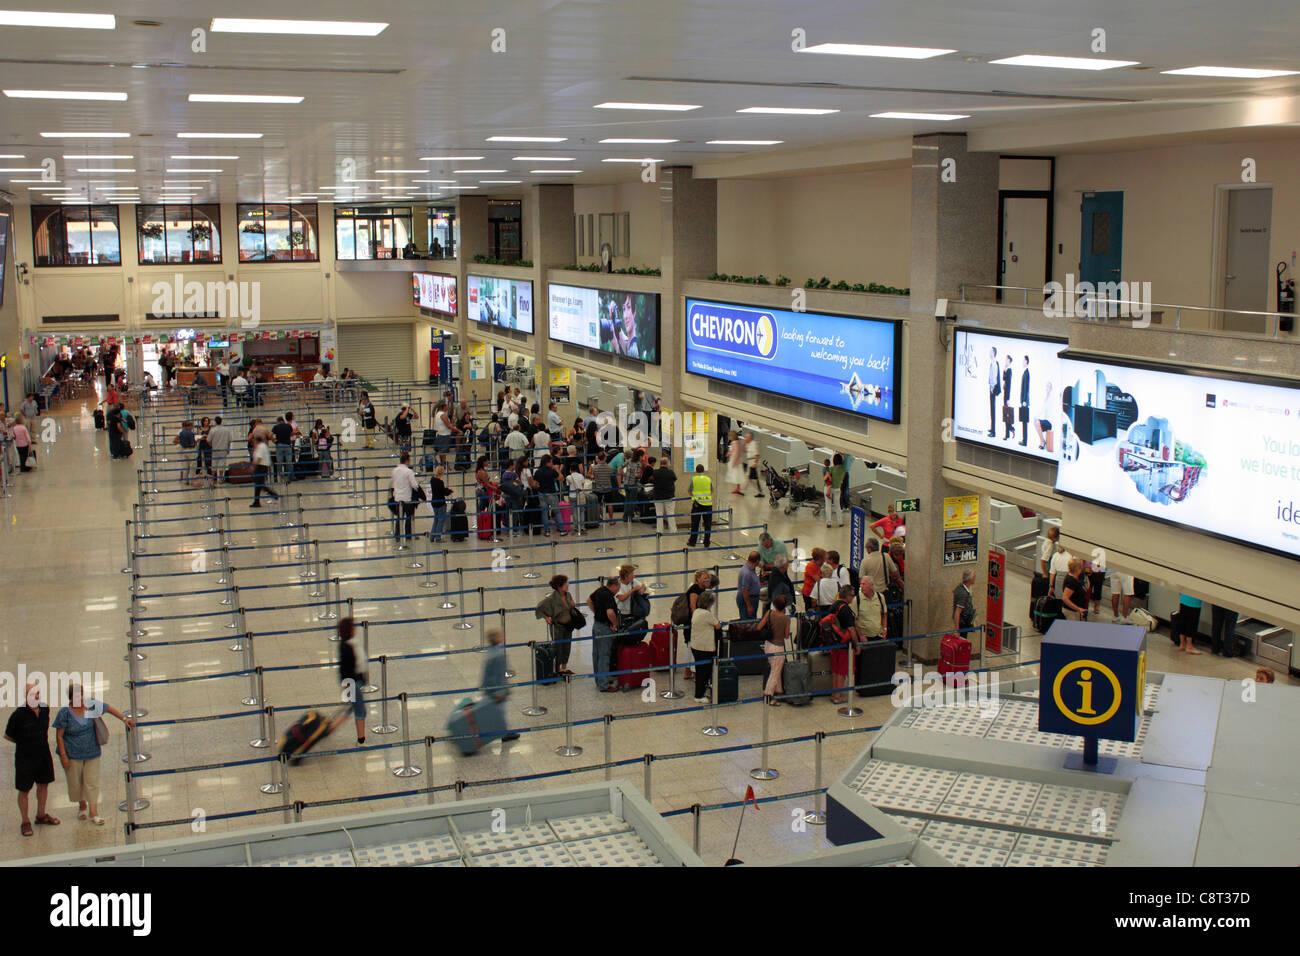 Passengers waiting to check in at Malta International Airport - Stock Image